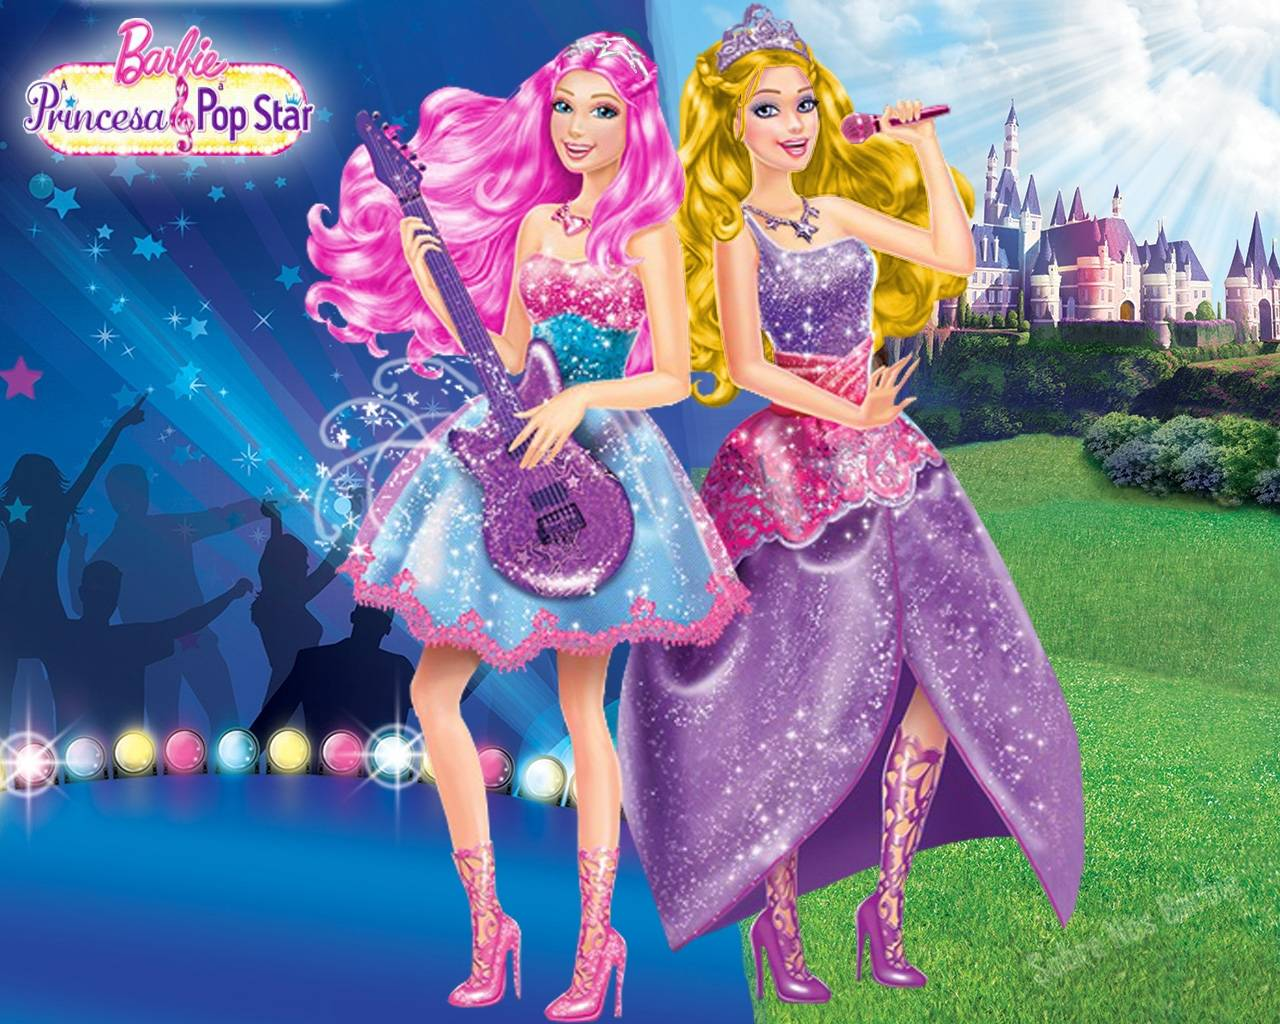 Barbie doll wallpapers wallpaper cave - Barbie princesse popstar ...